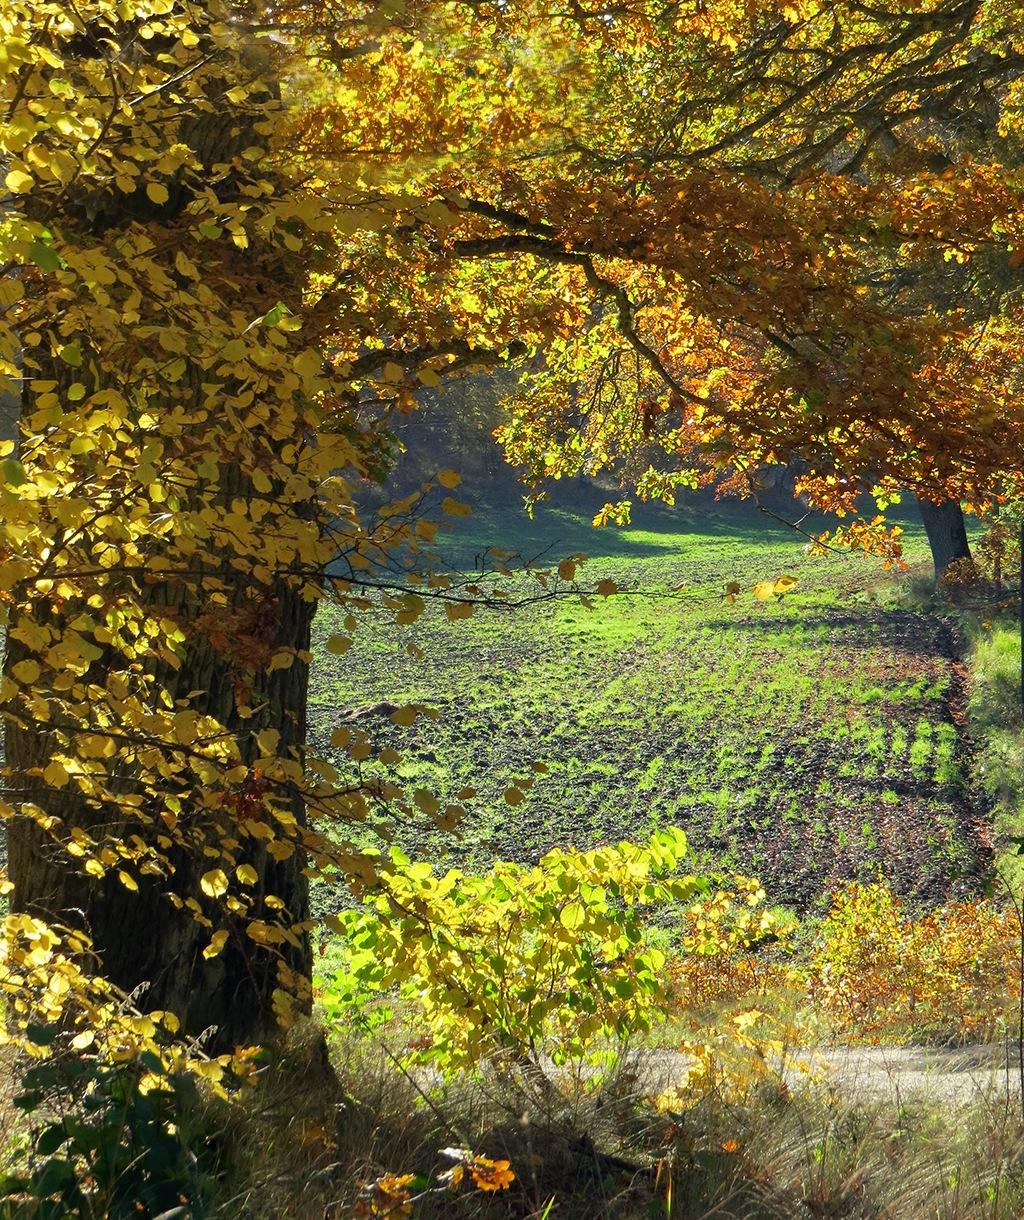 The Oaks Change Color by susanne.m.andersson.92